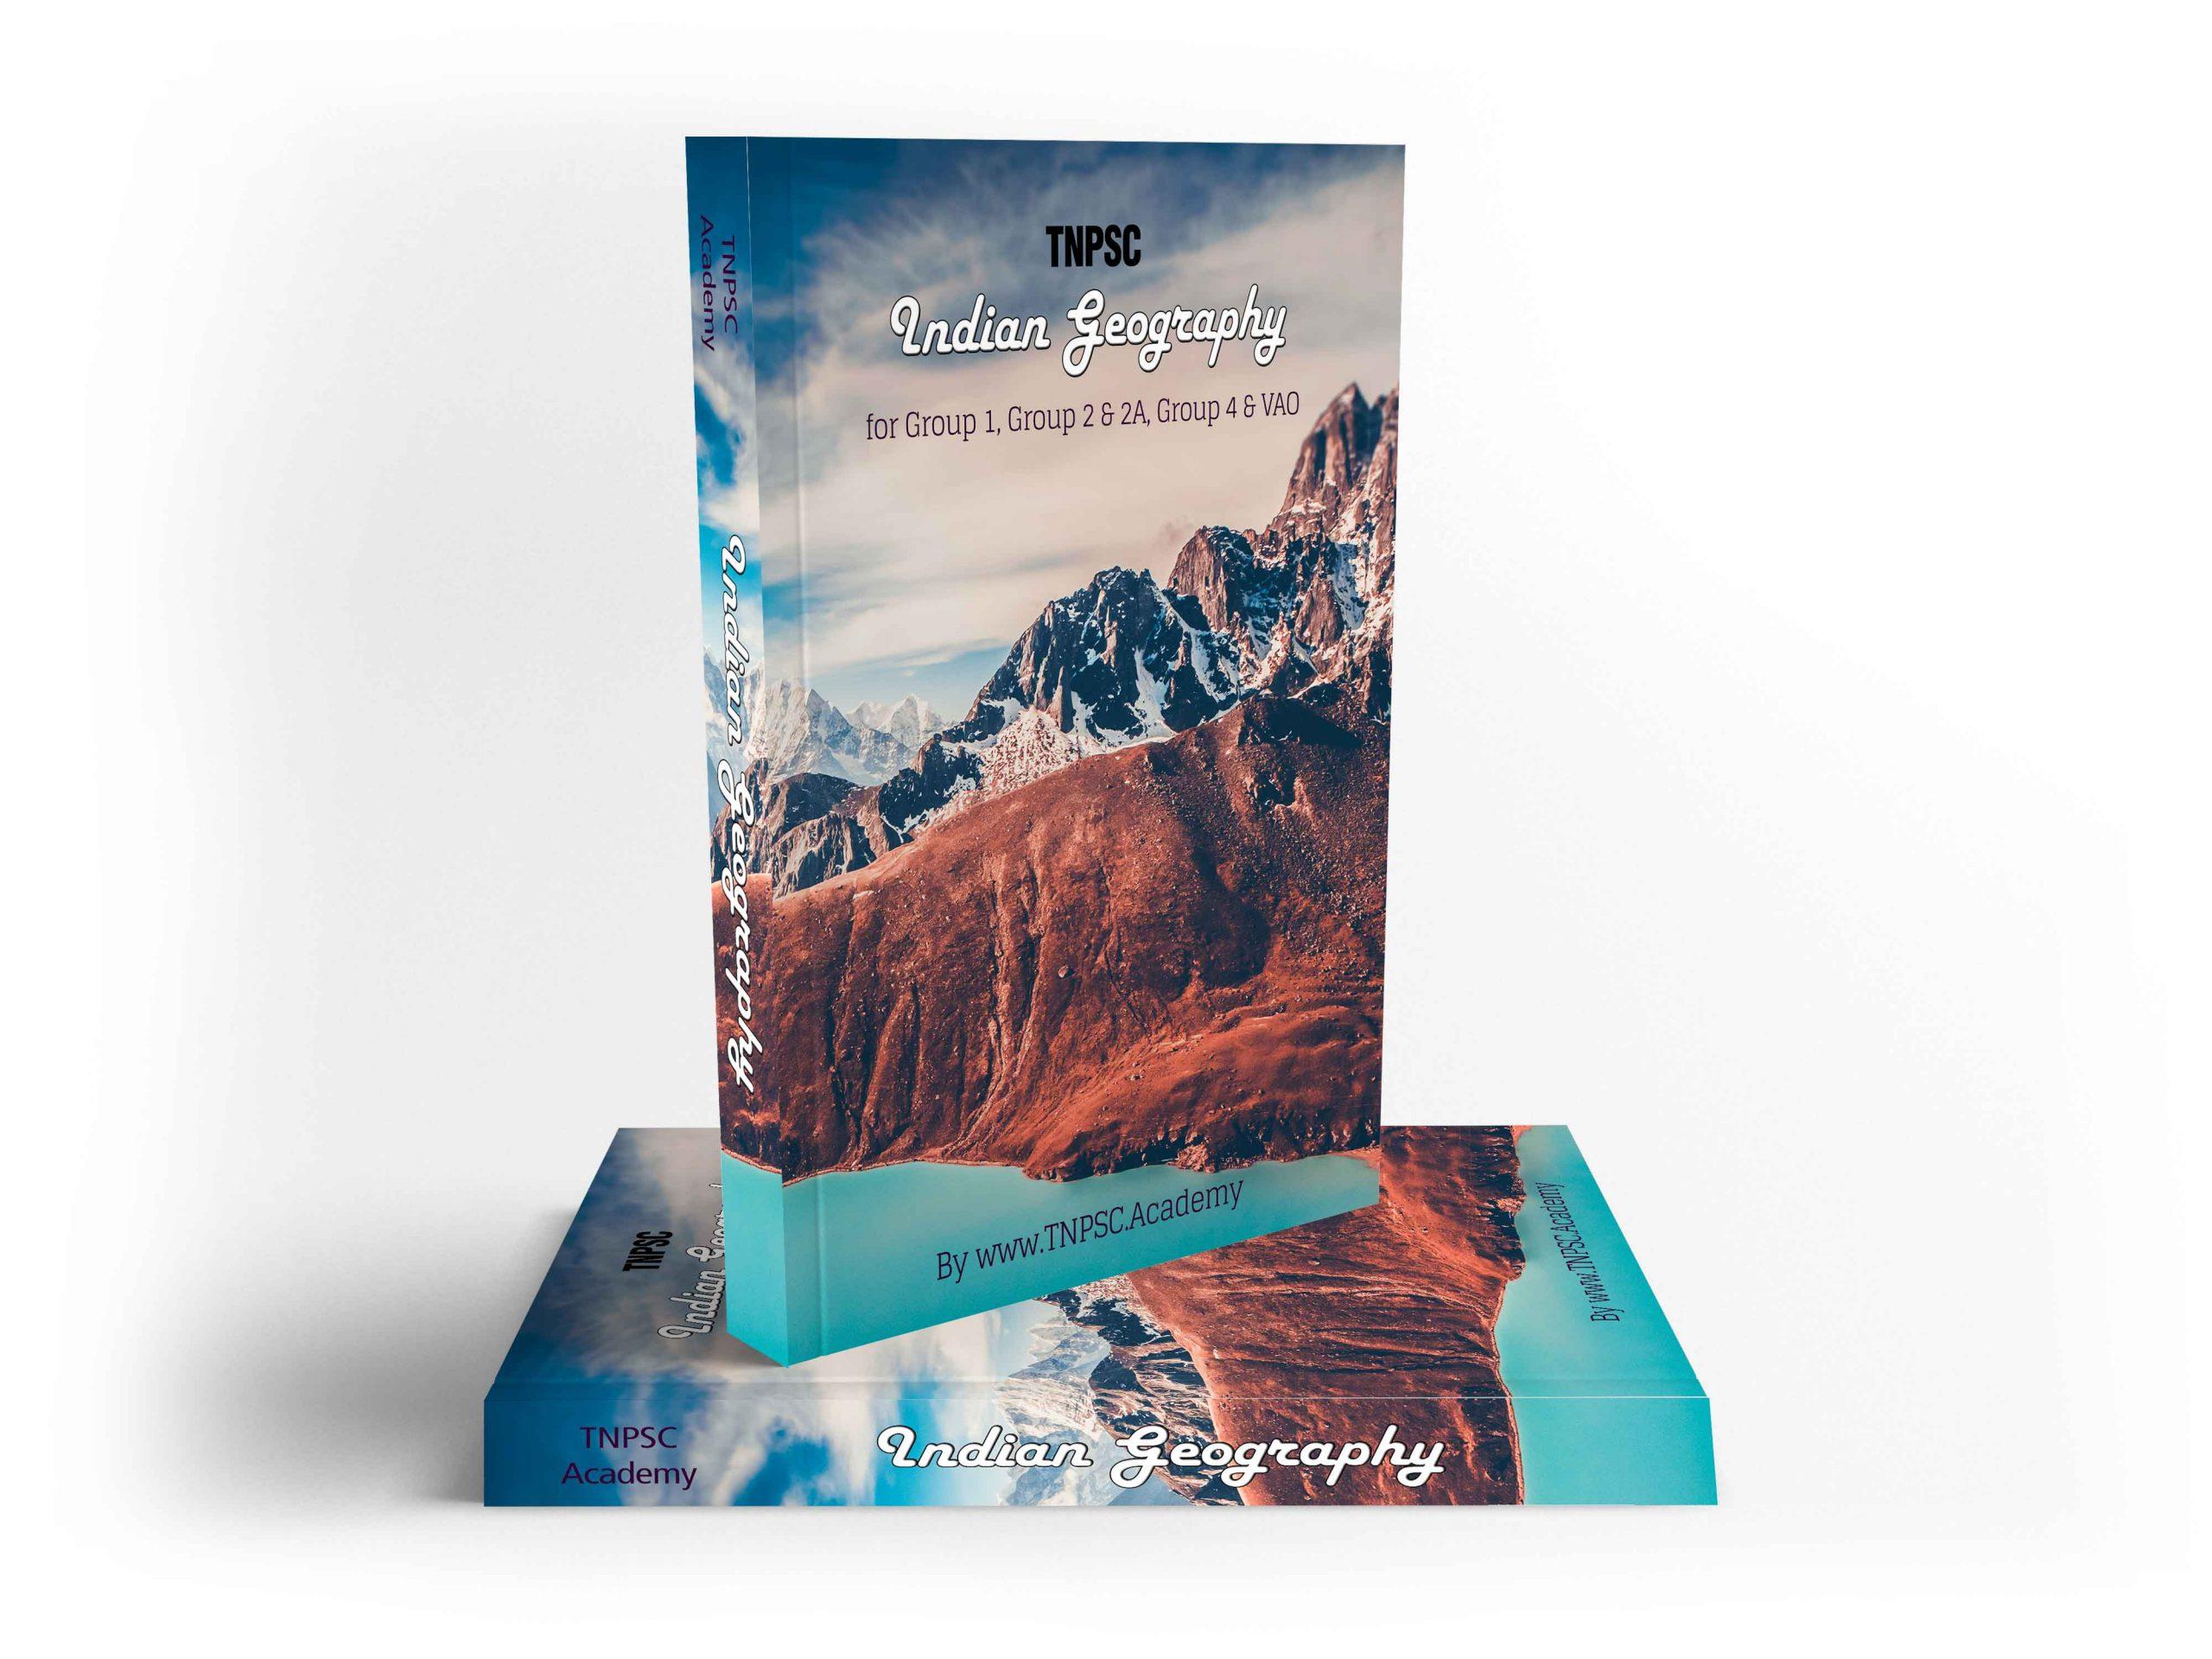 Geogrpahy Book